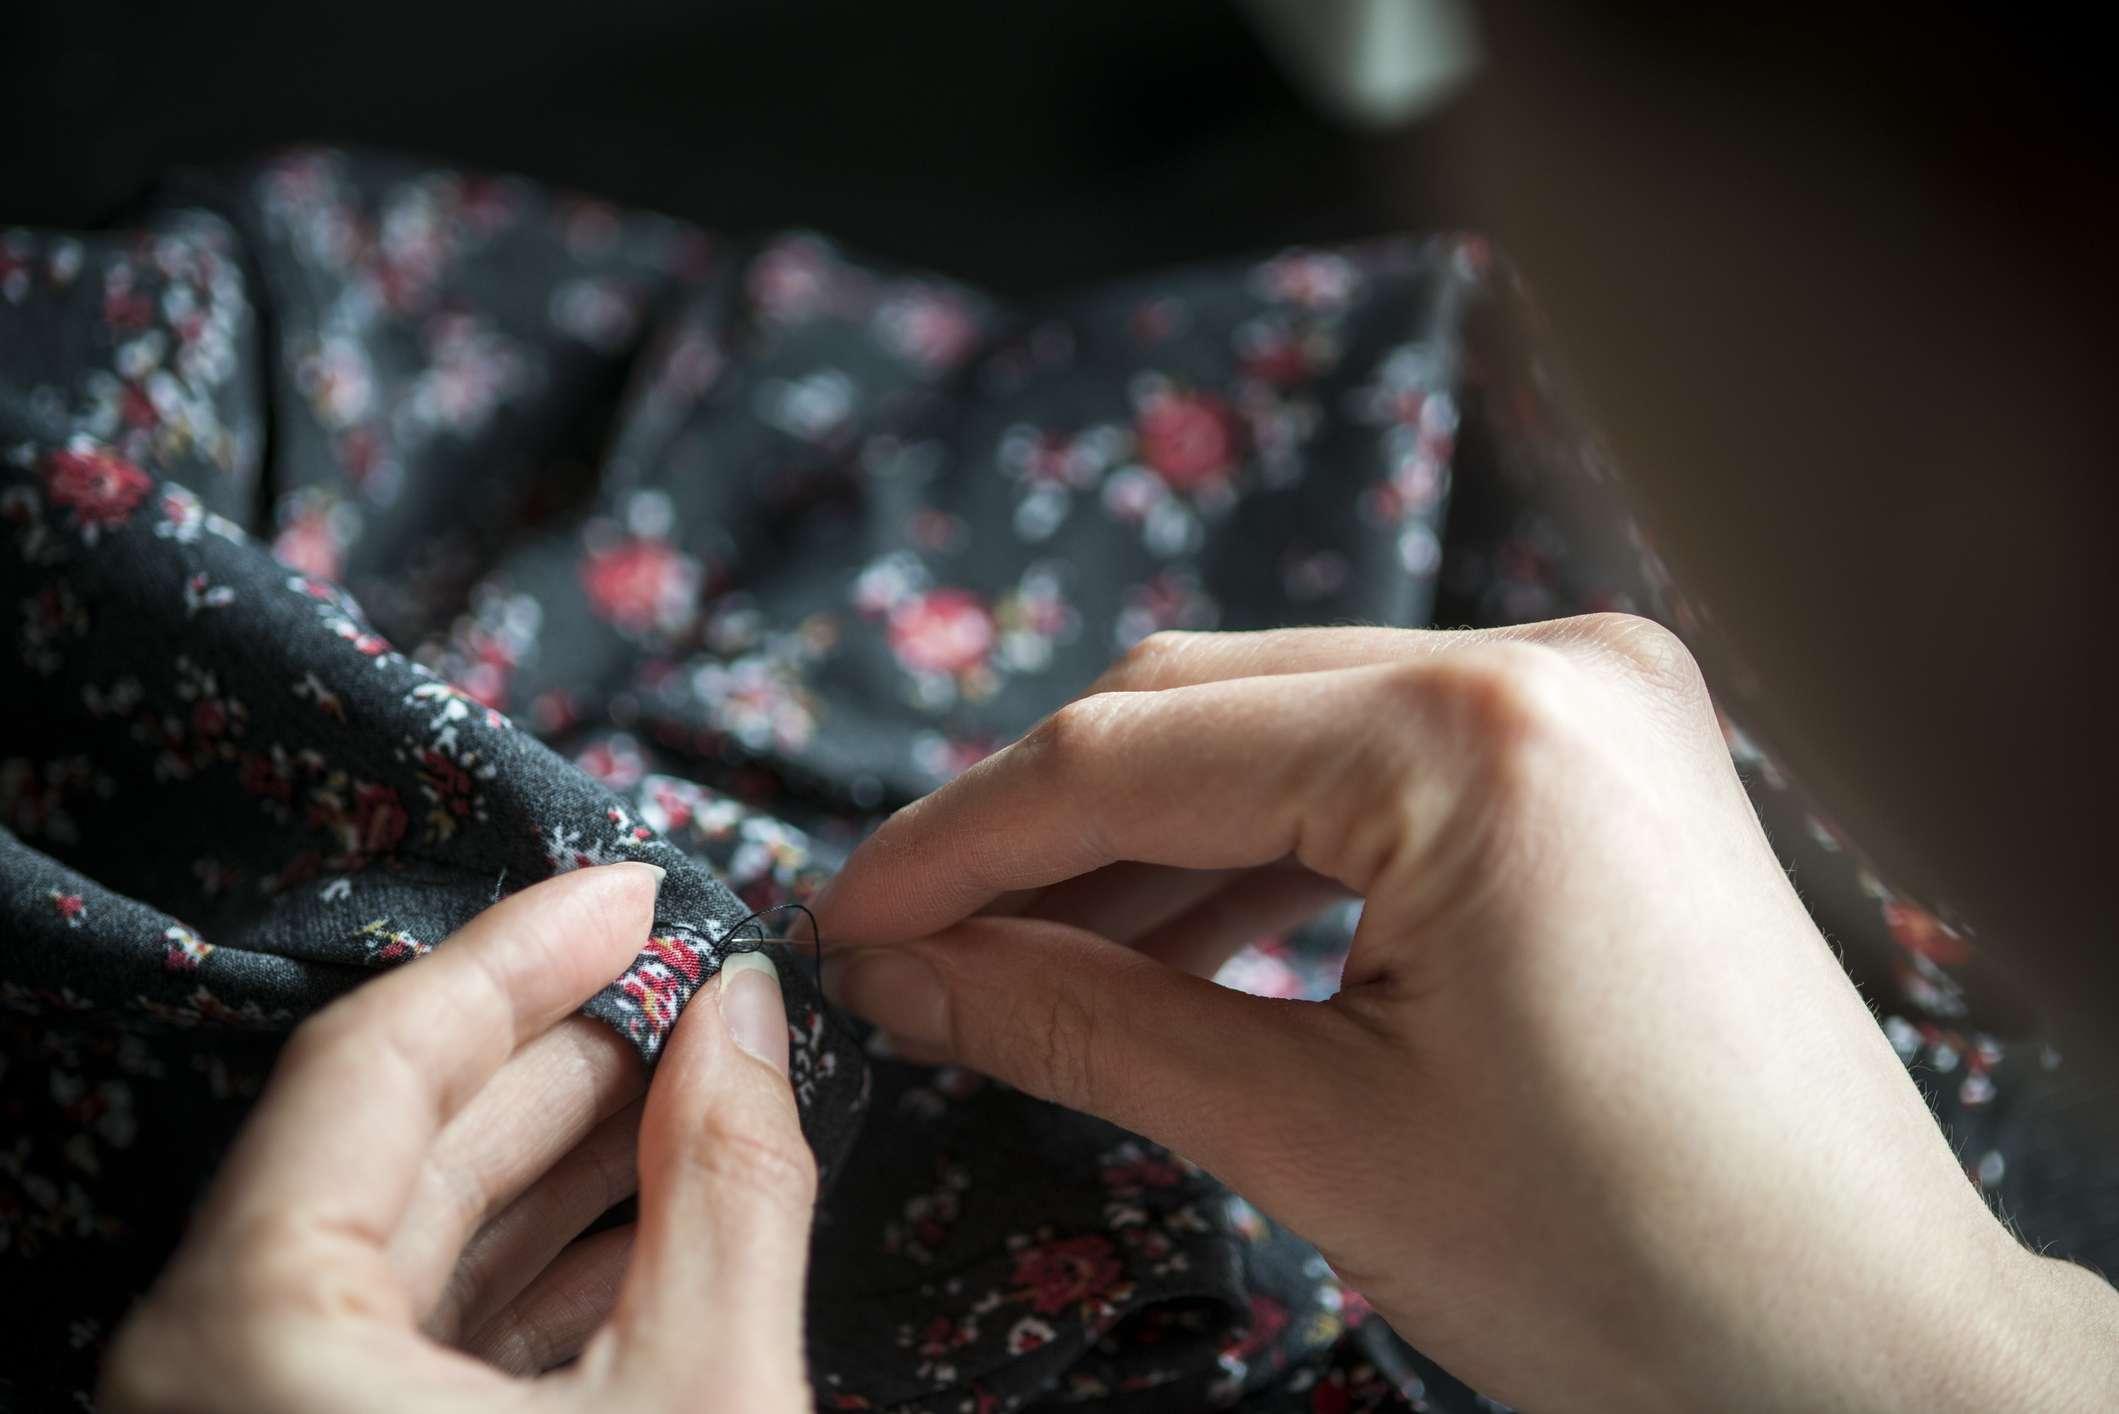 Woman sewing seam